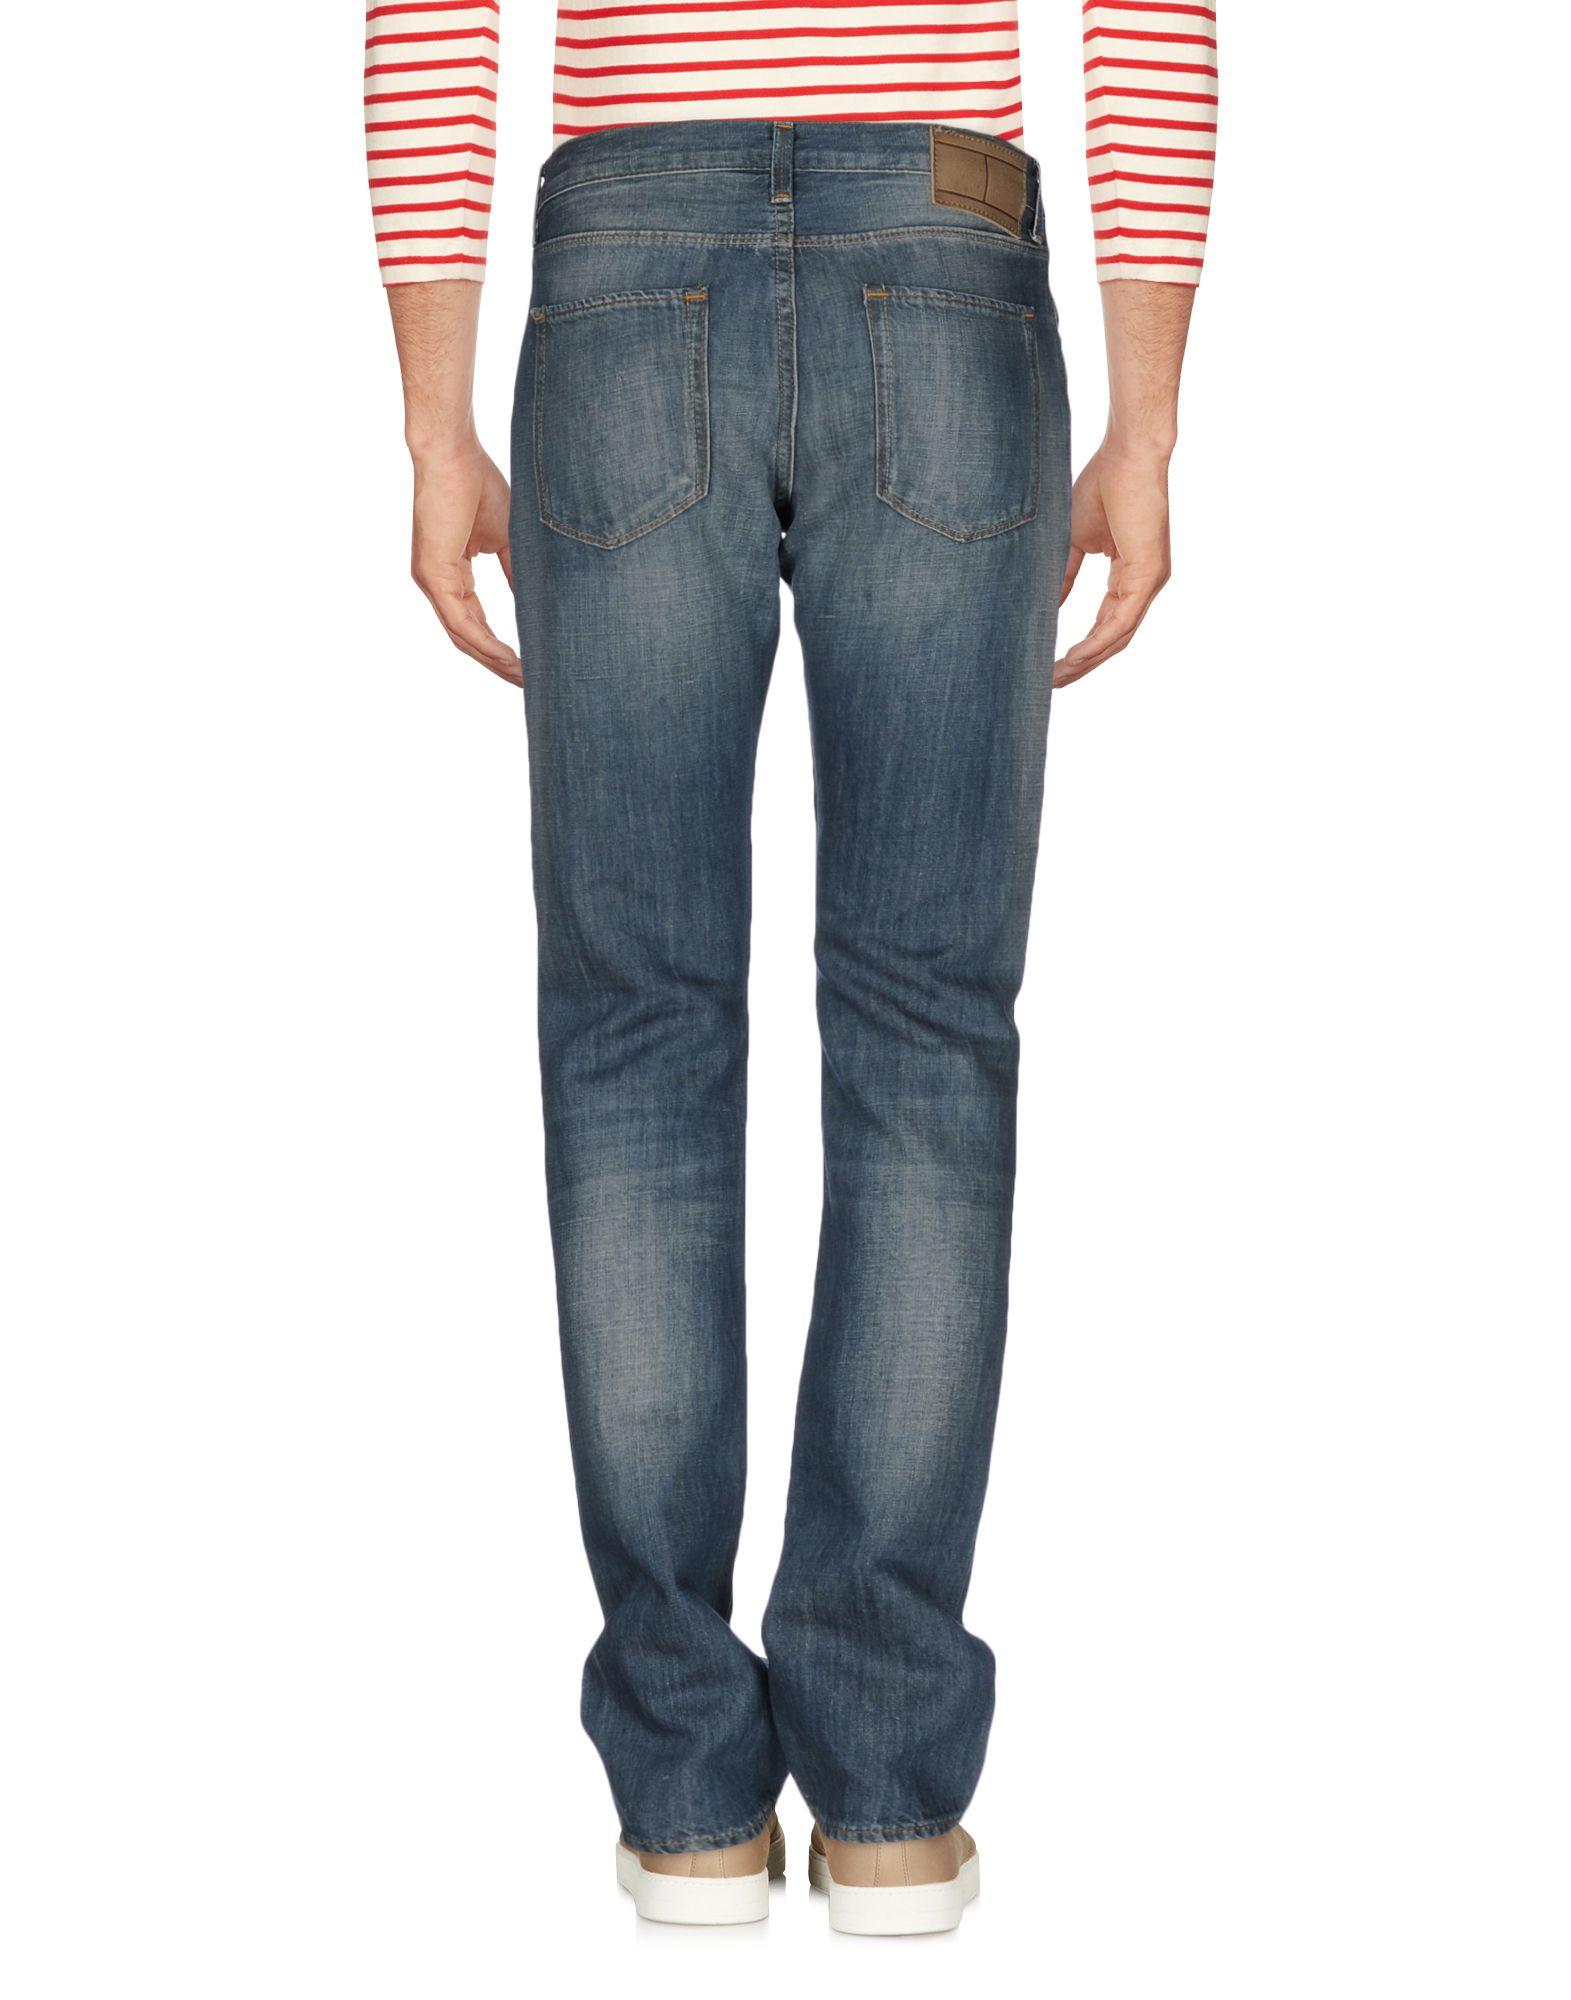 Pantaloni Jeans Tommy Hilfiger Uomo Uomo Uomo - 42558271AN 438514